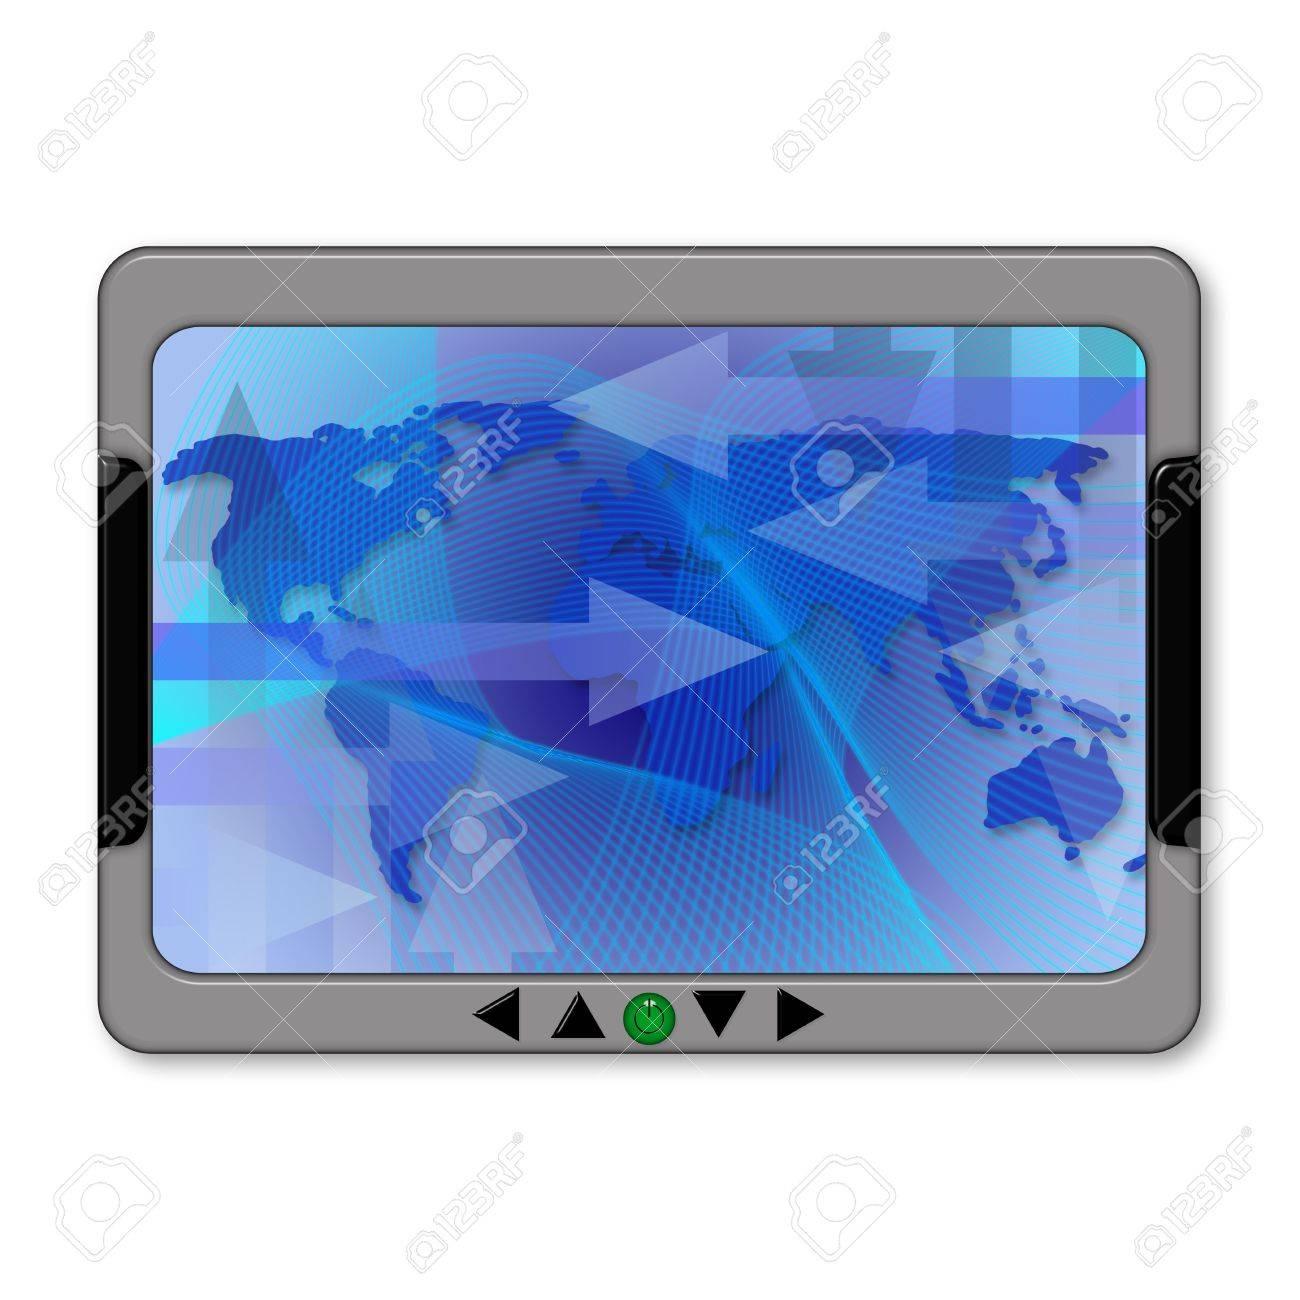 Illustration of a gps navigator with world map Stock Illustration - 4337662